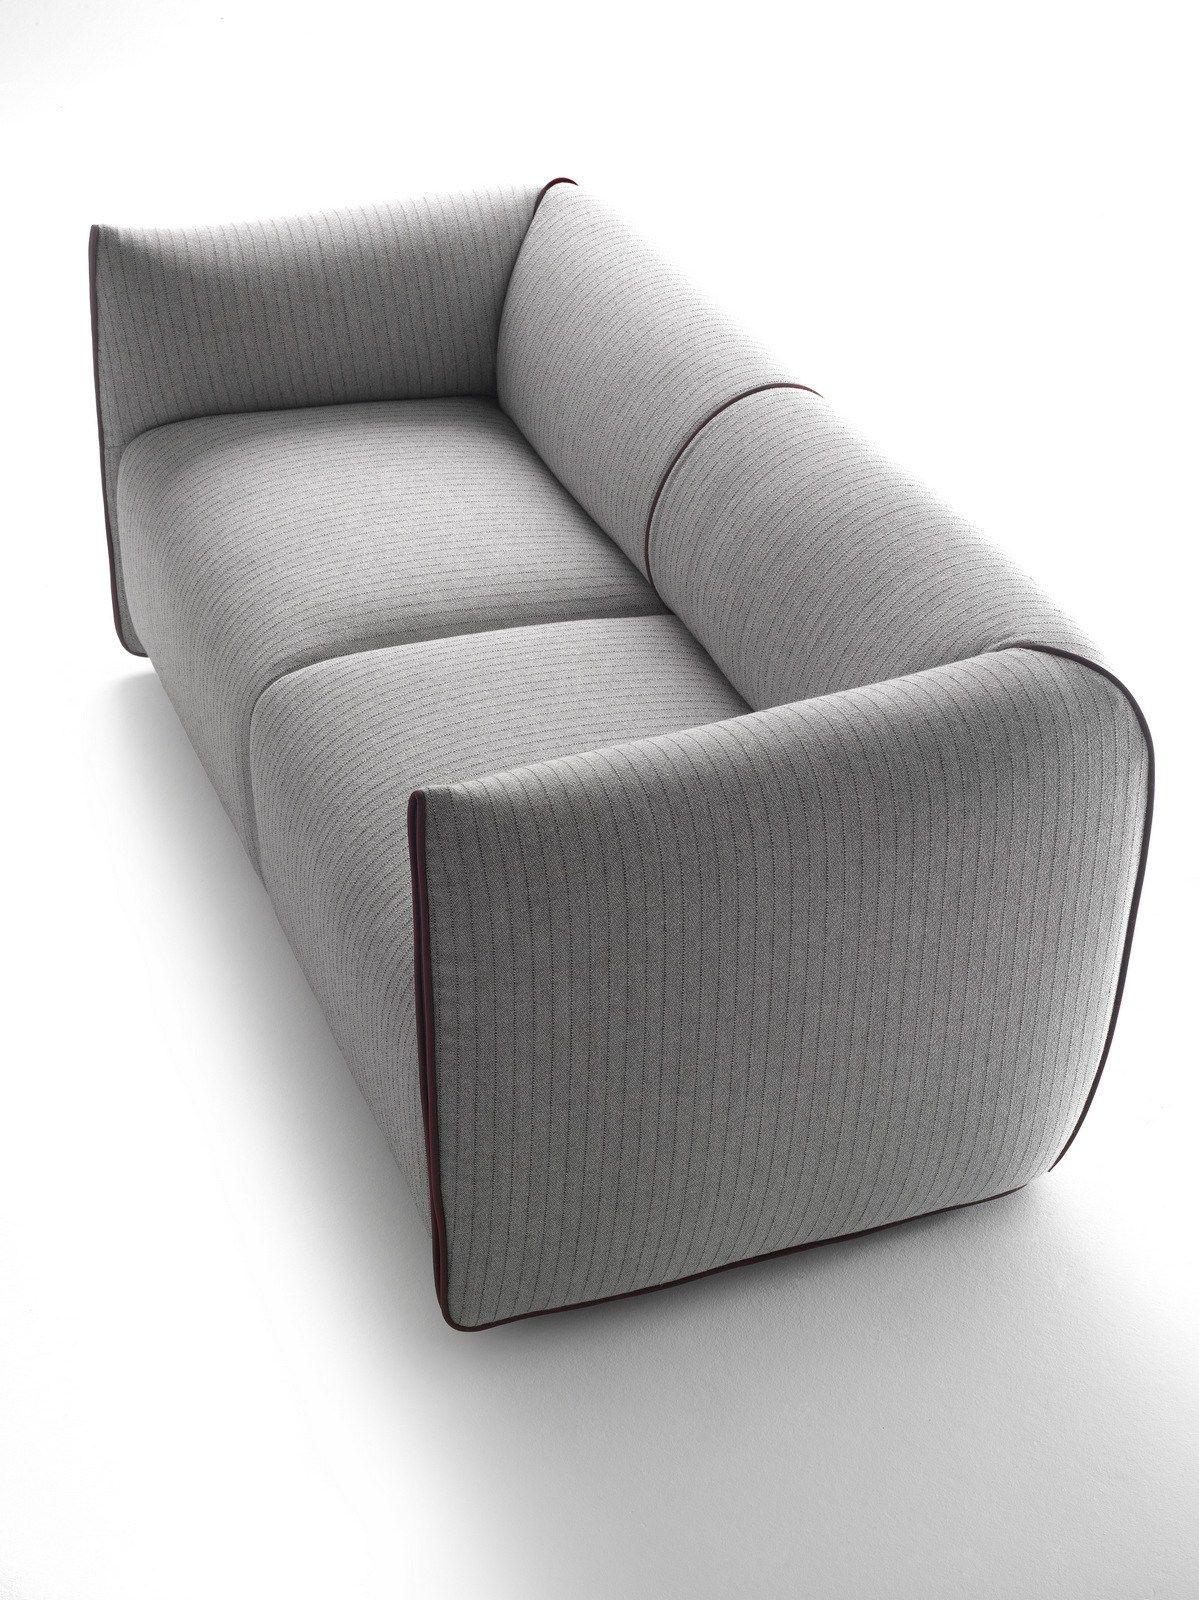 Try A Recliner Sofa And You Ll Never Go Back Mdf Modelos De Sofa Moveis Sala